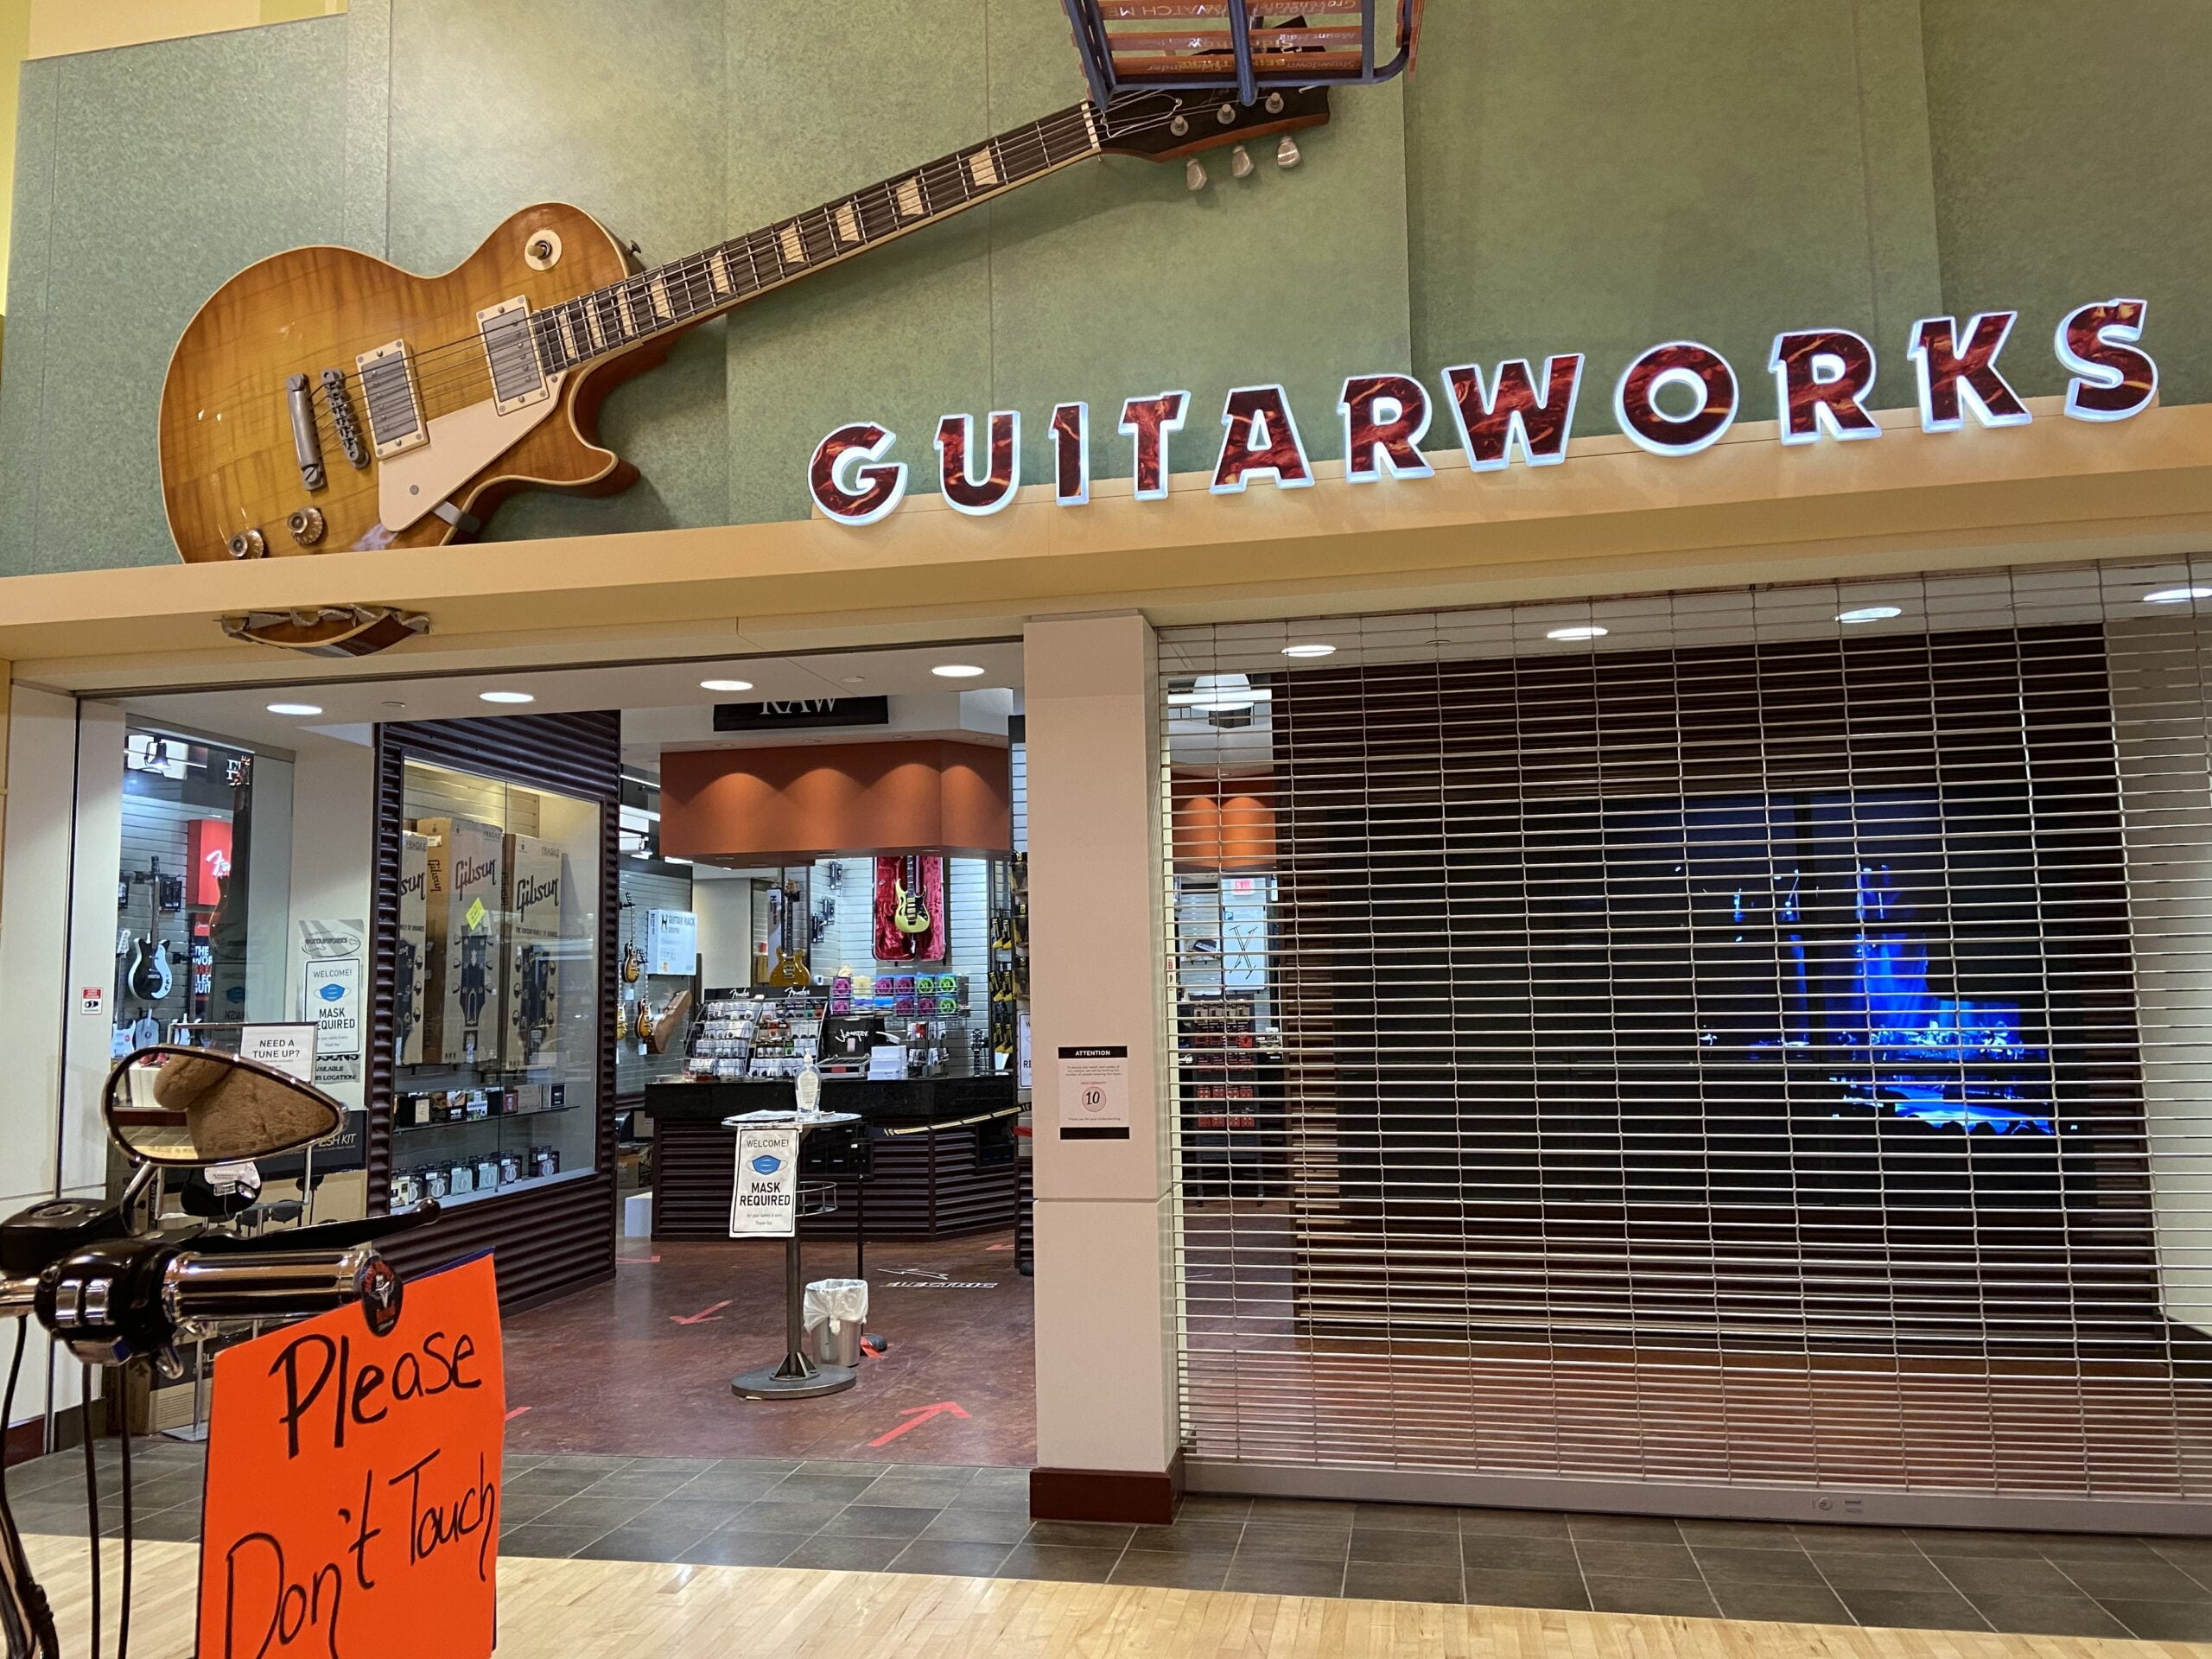 Guitarworks at CrossIron Mills